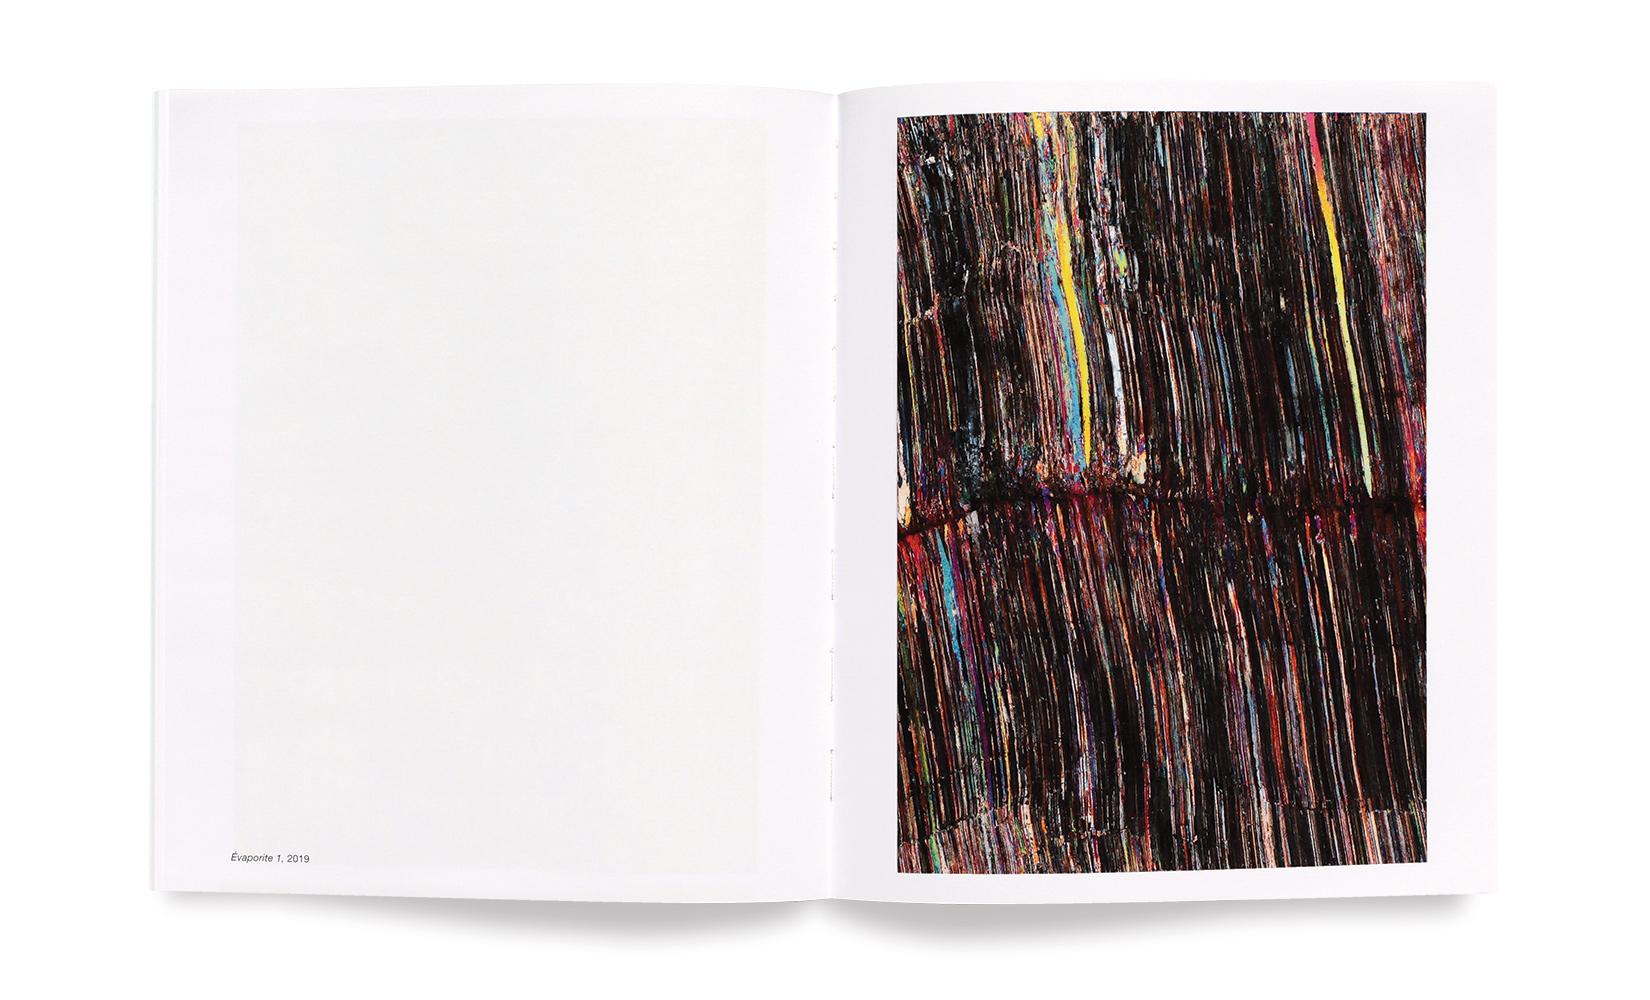 versailles-visible-invisible-toluca-studio-olivier-andreotti-ALLOUCHE-3.jpg